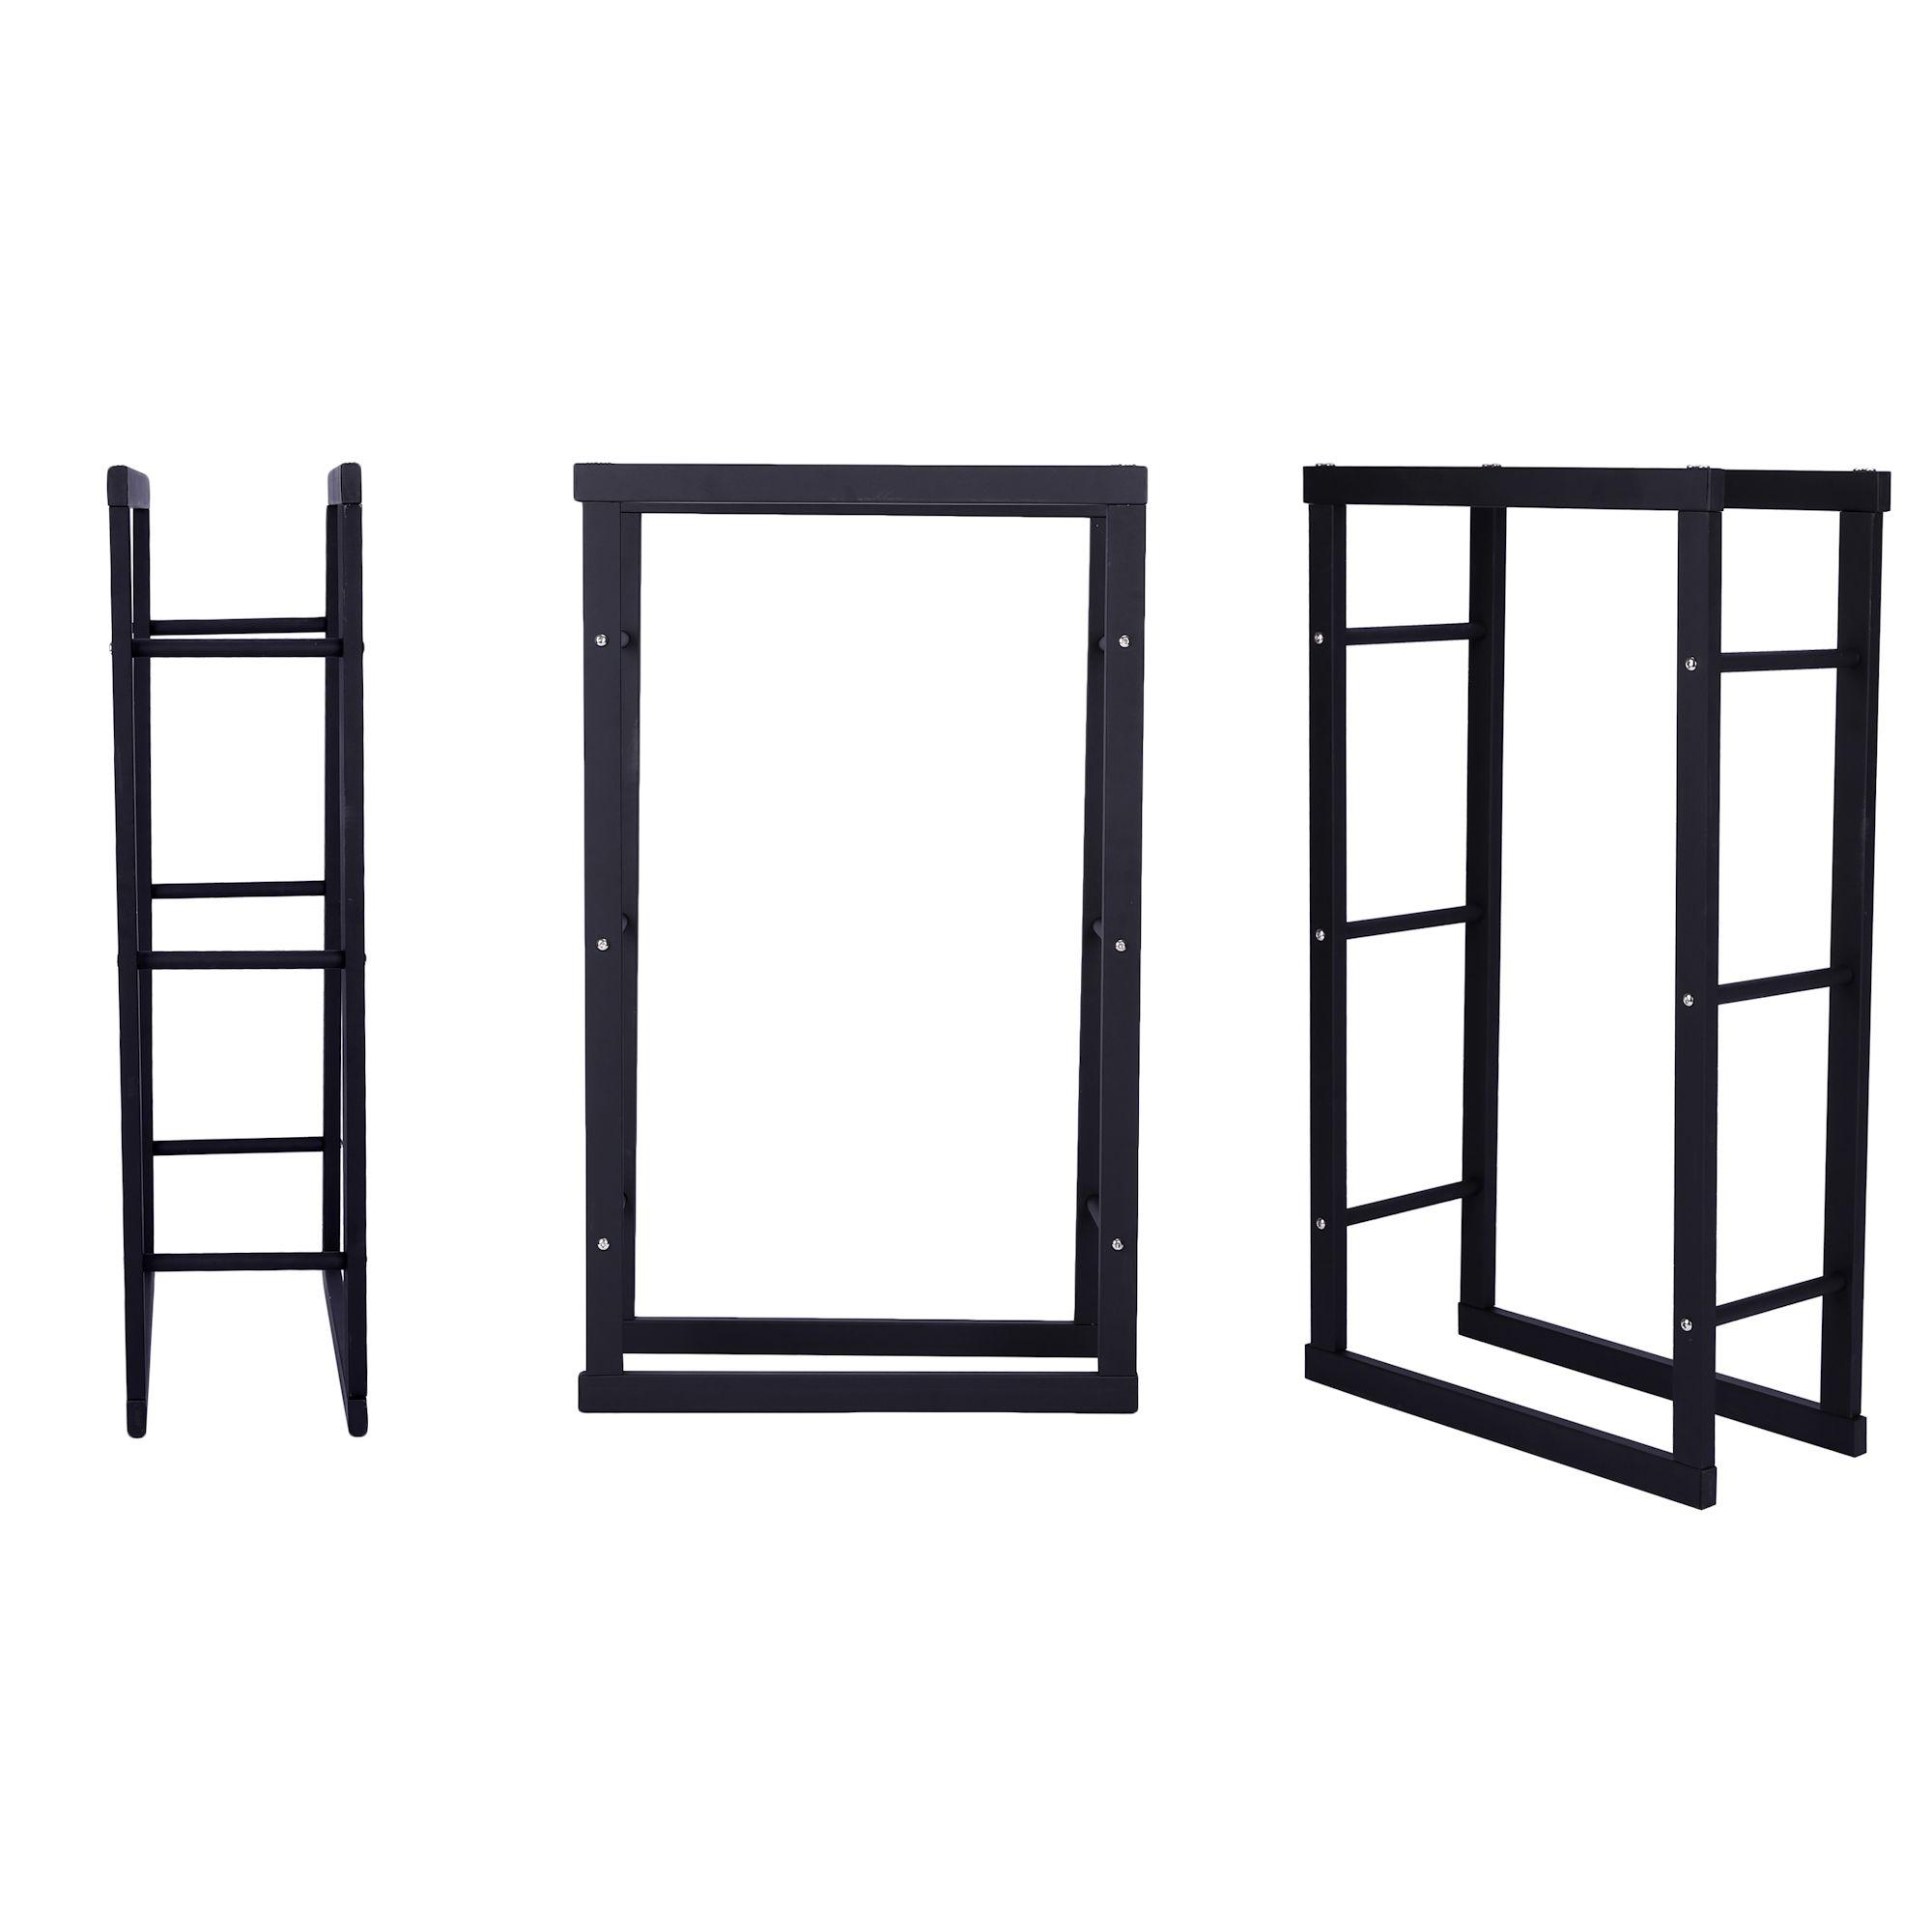 kaminholzregal holzregal brennholzregal brennholzlager kaminholzablage auswahl ebay. Black Bedroom Furniture Sets. Home Design Ideas